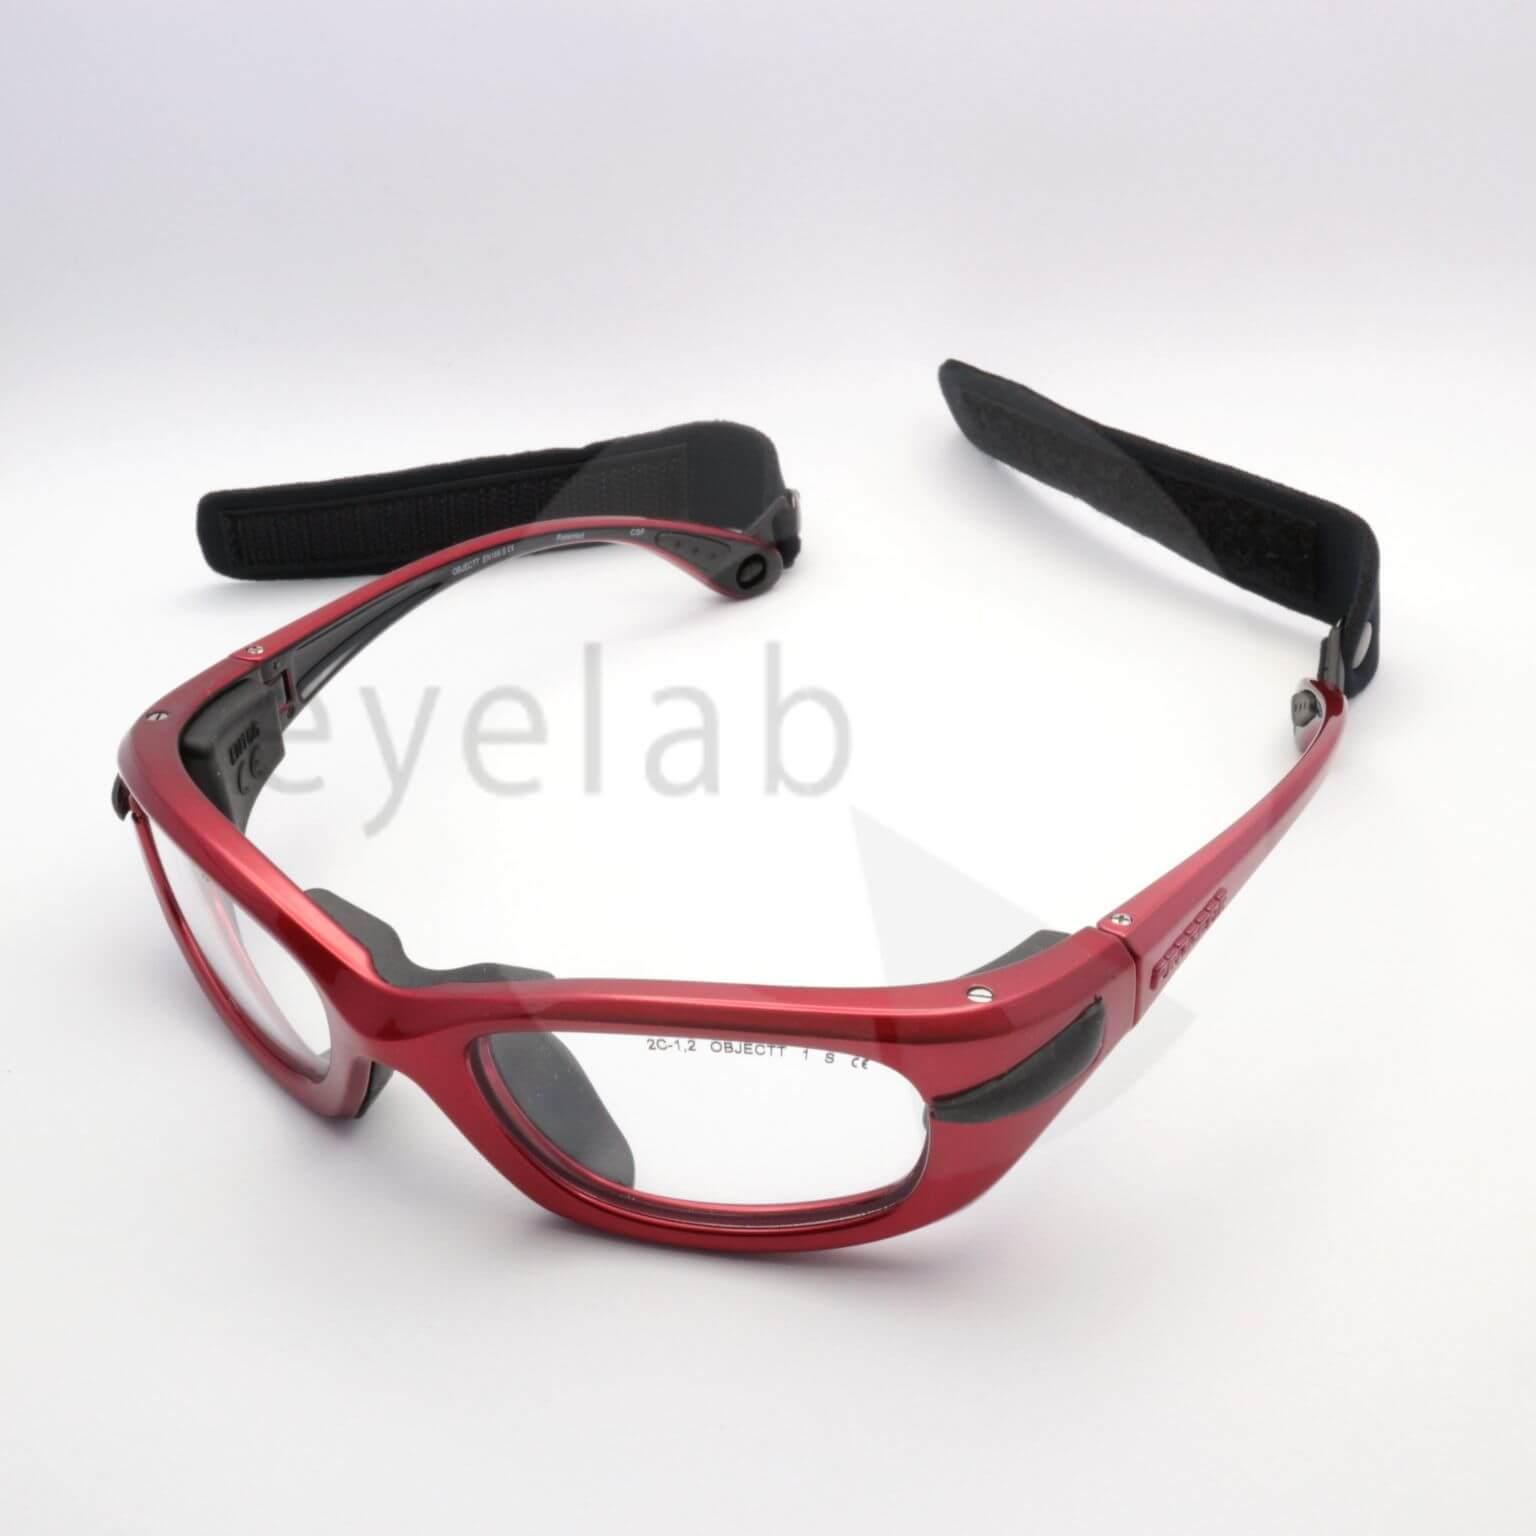 106a1bc24a PROGEAR 1020 5 ΓΥΑΛΙΑ ΓΙΑ ΣΠΟΡ ~ Eyelab